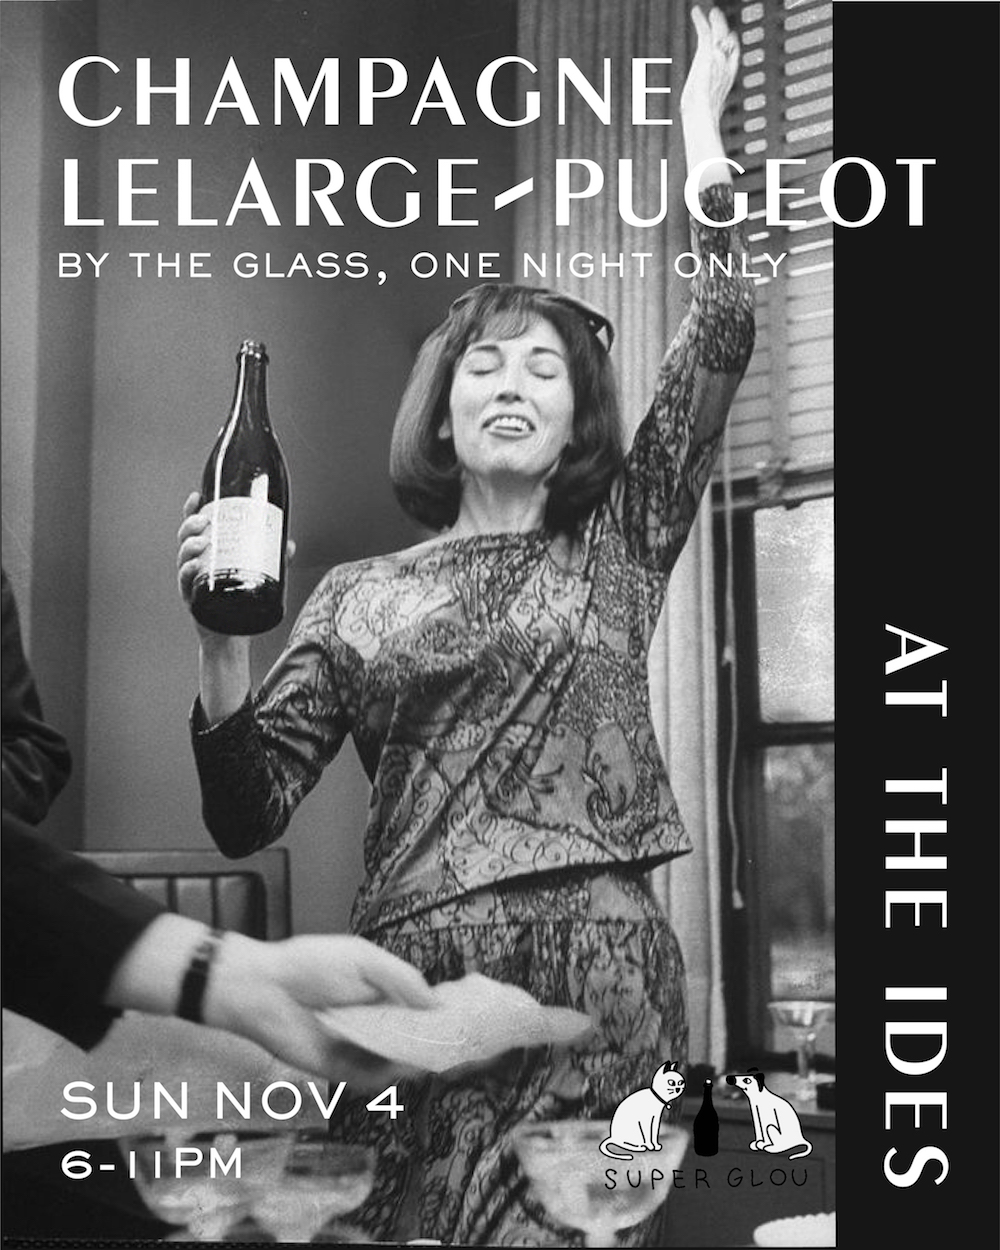 Ides_Champagne_Event_Sun Nov 4.jpg